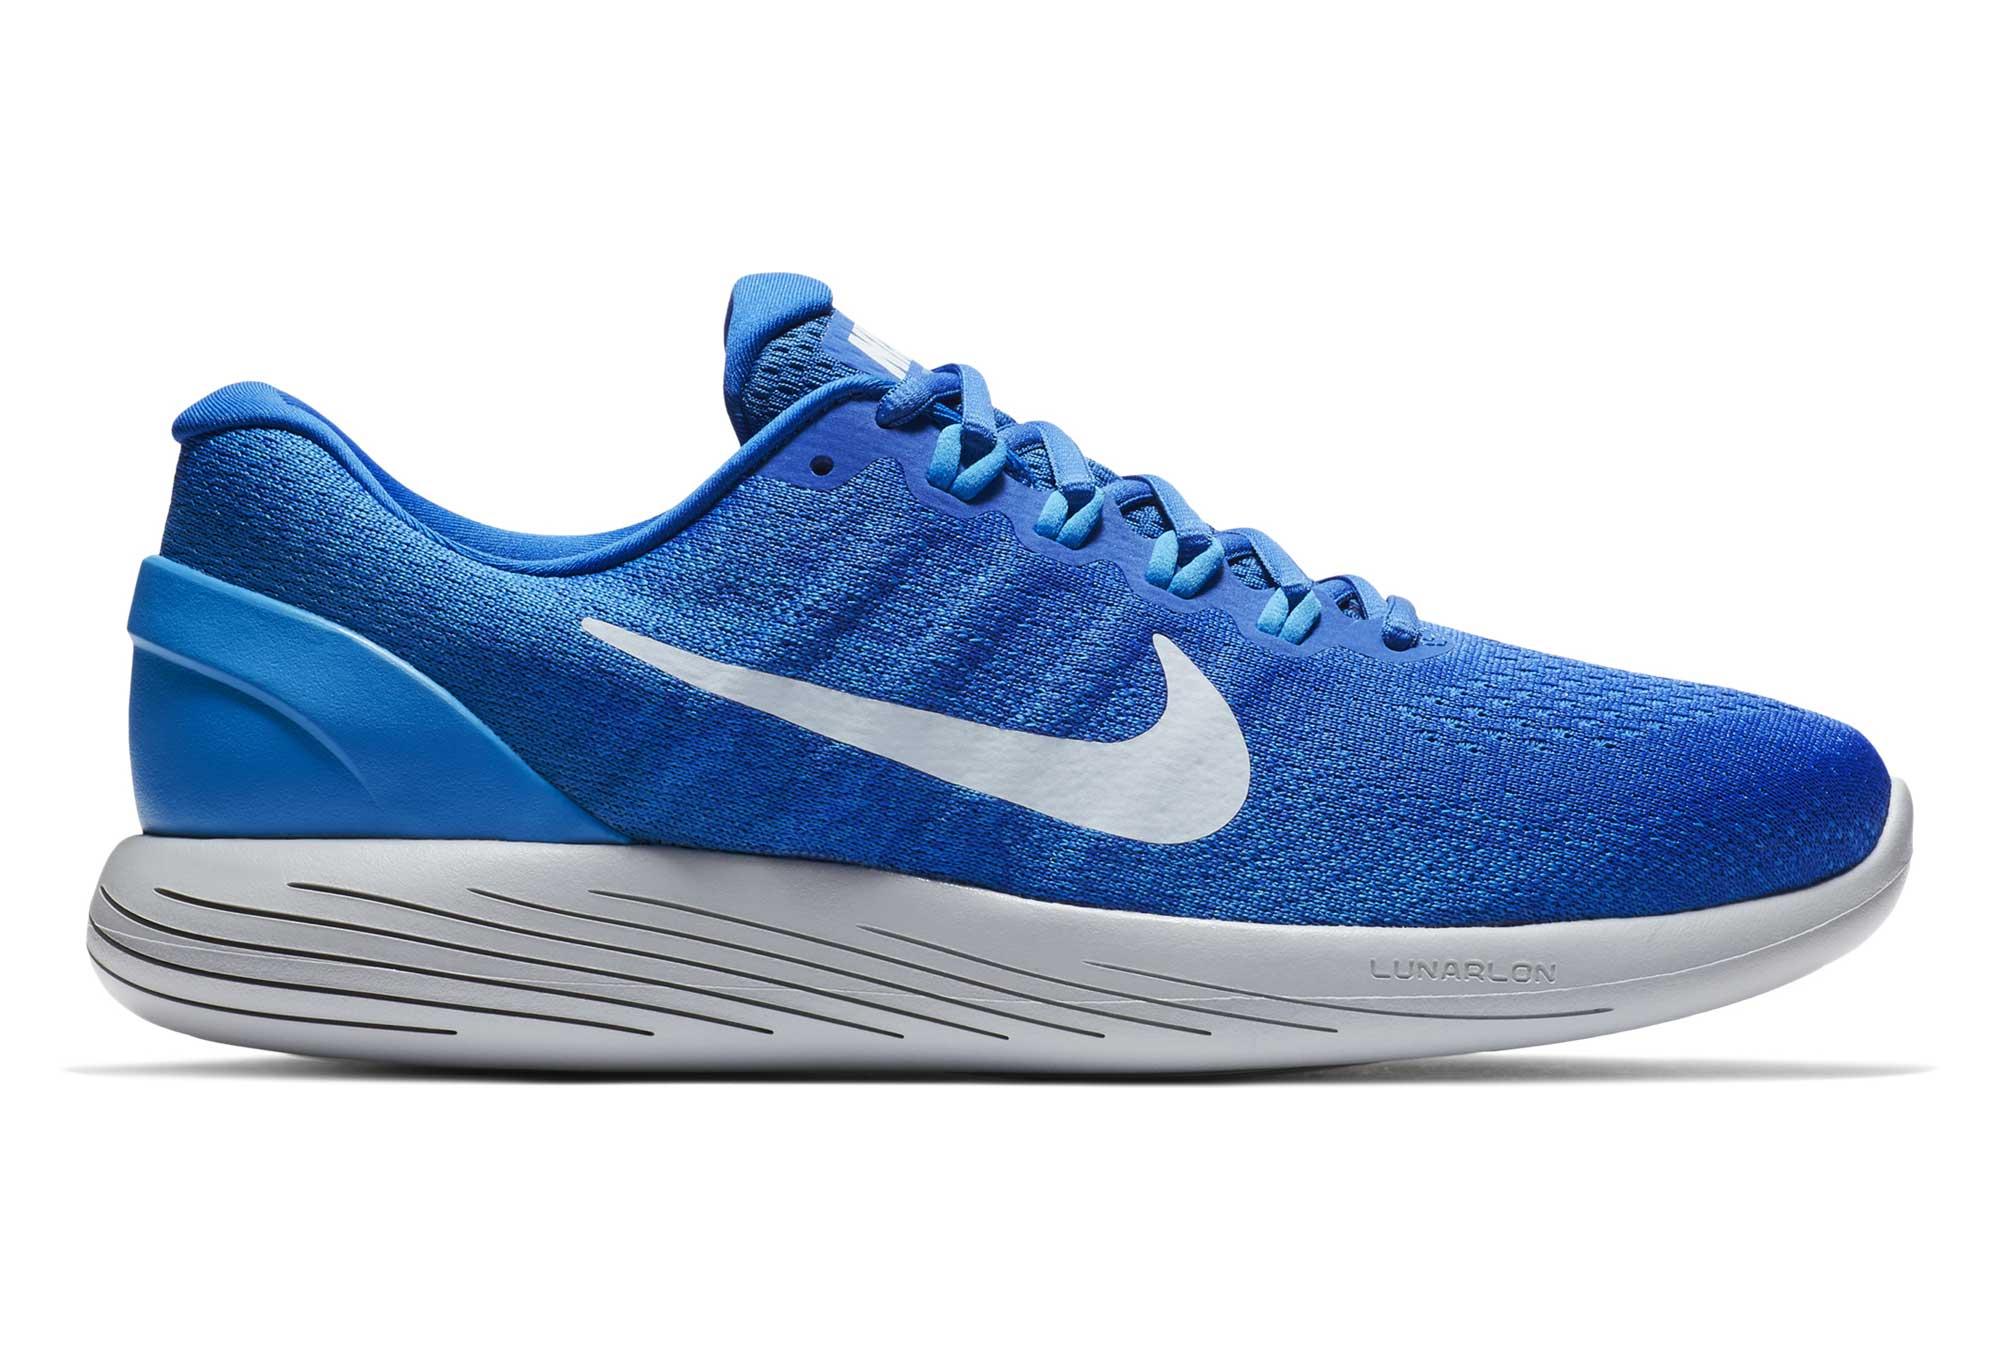 separation shoes bc4f4 21120 Chaussures de Running Nike LunarGlide 9 Bleu